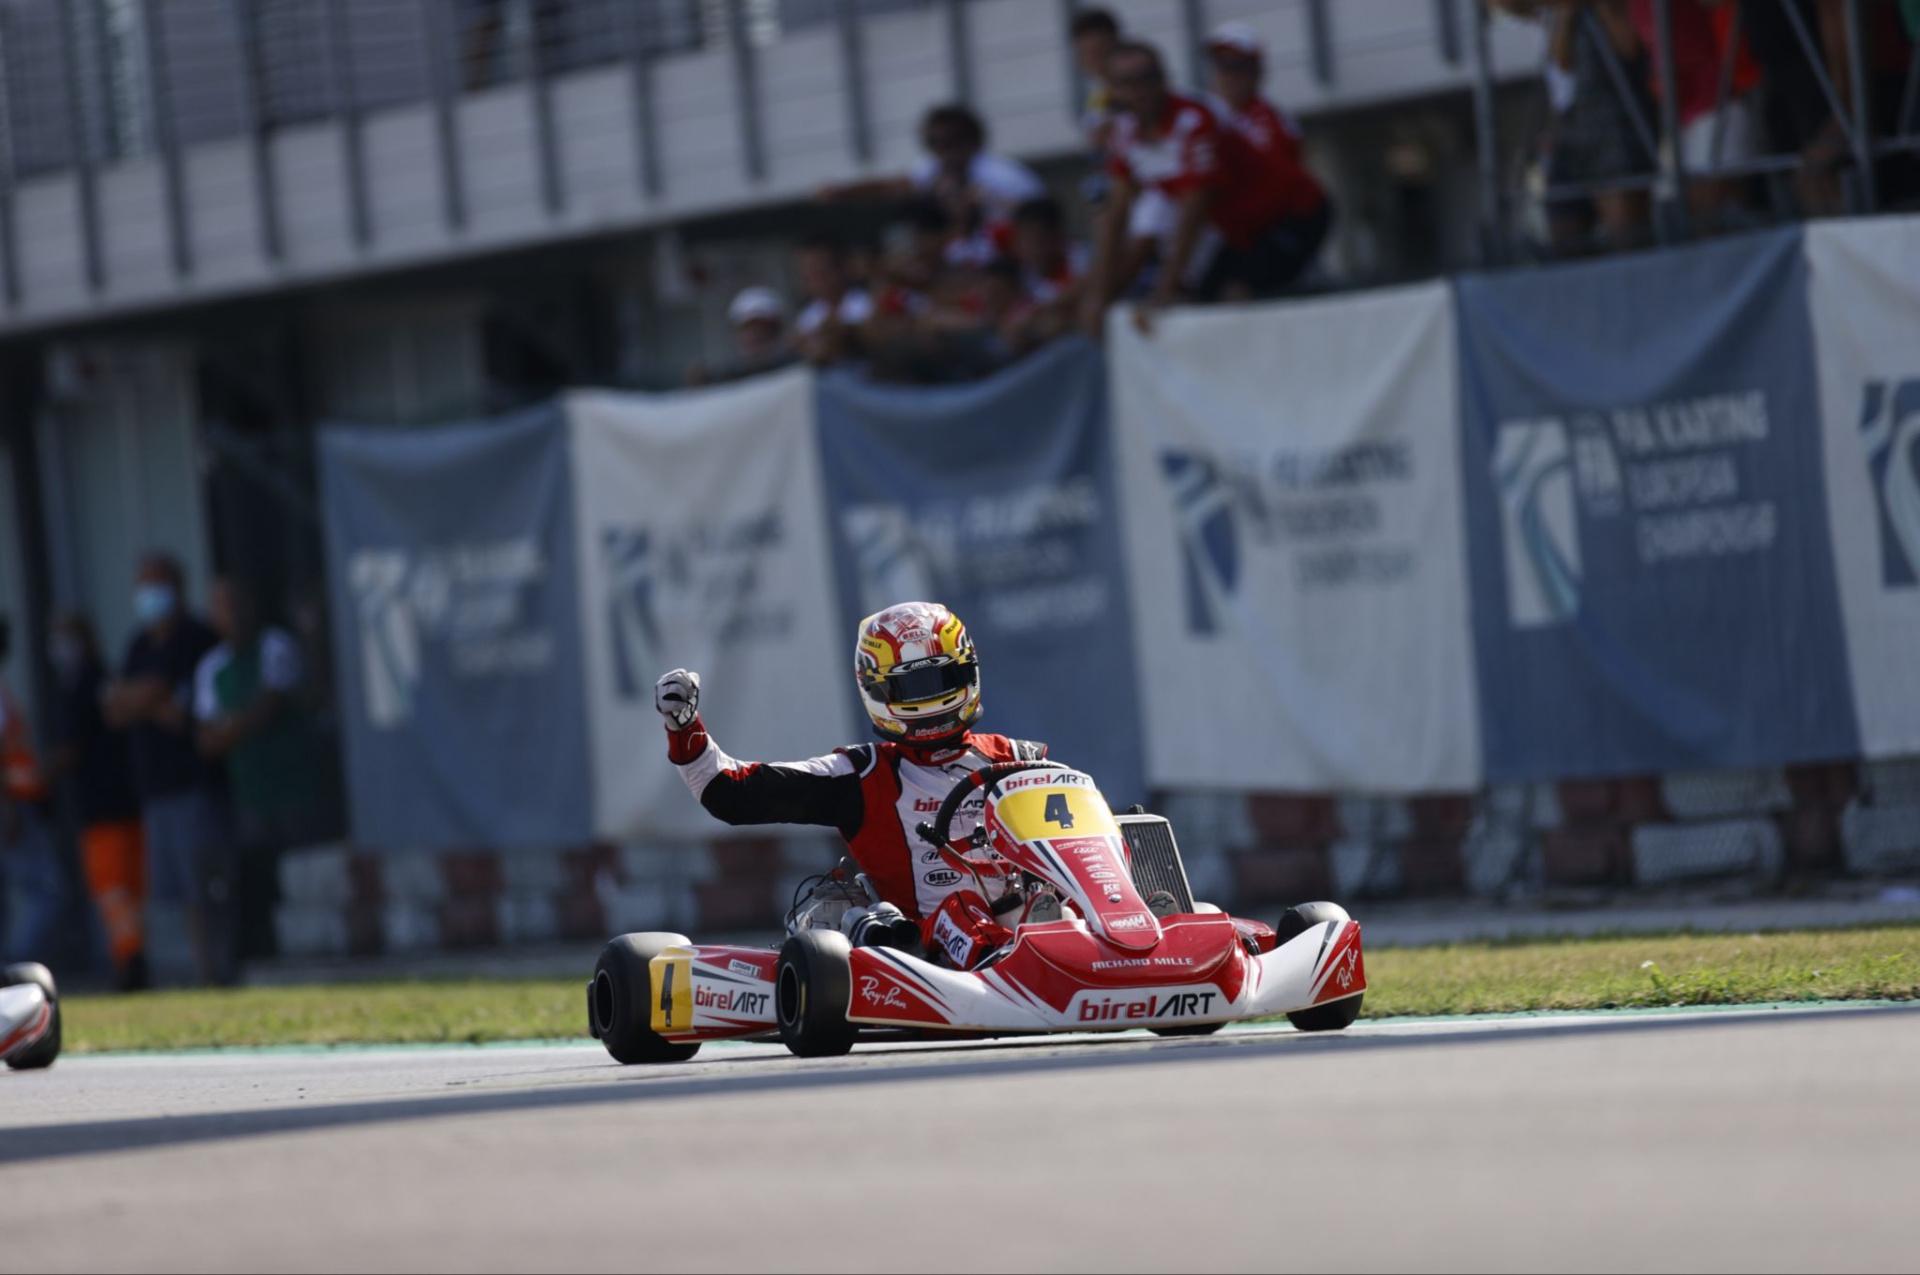 FIA Karting Euro, Adria - Pollini and Longhi European Champions